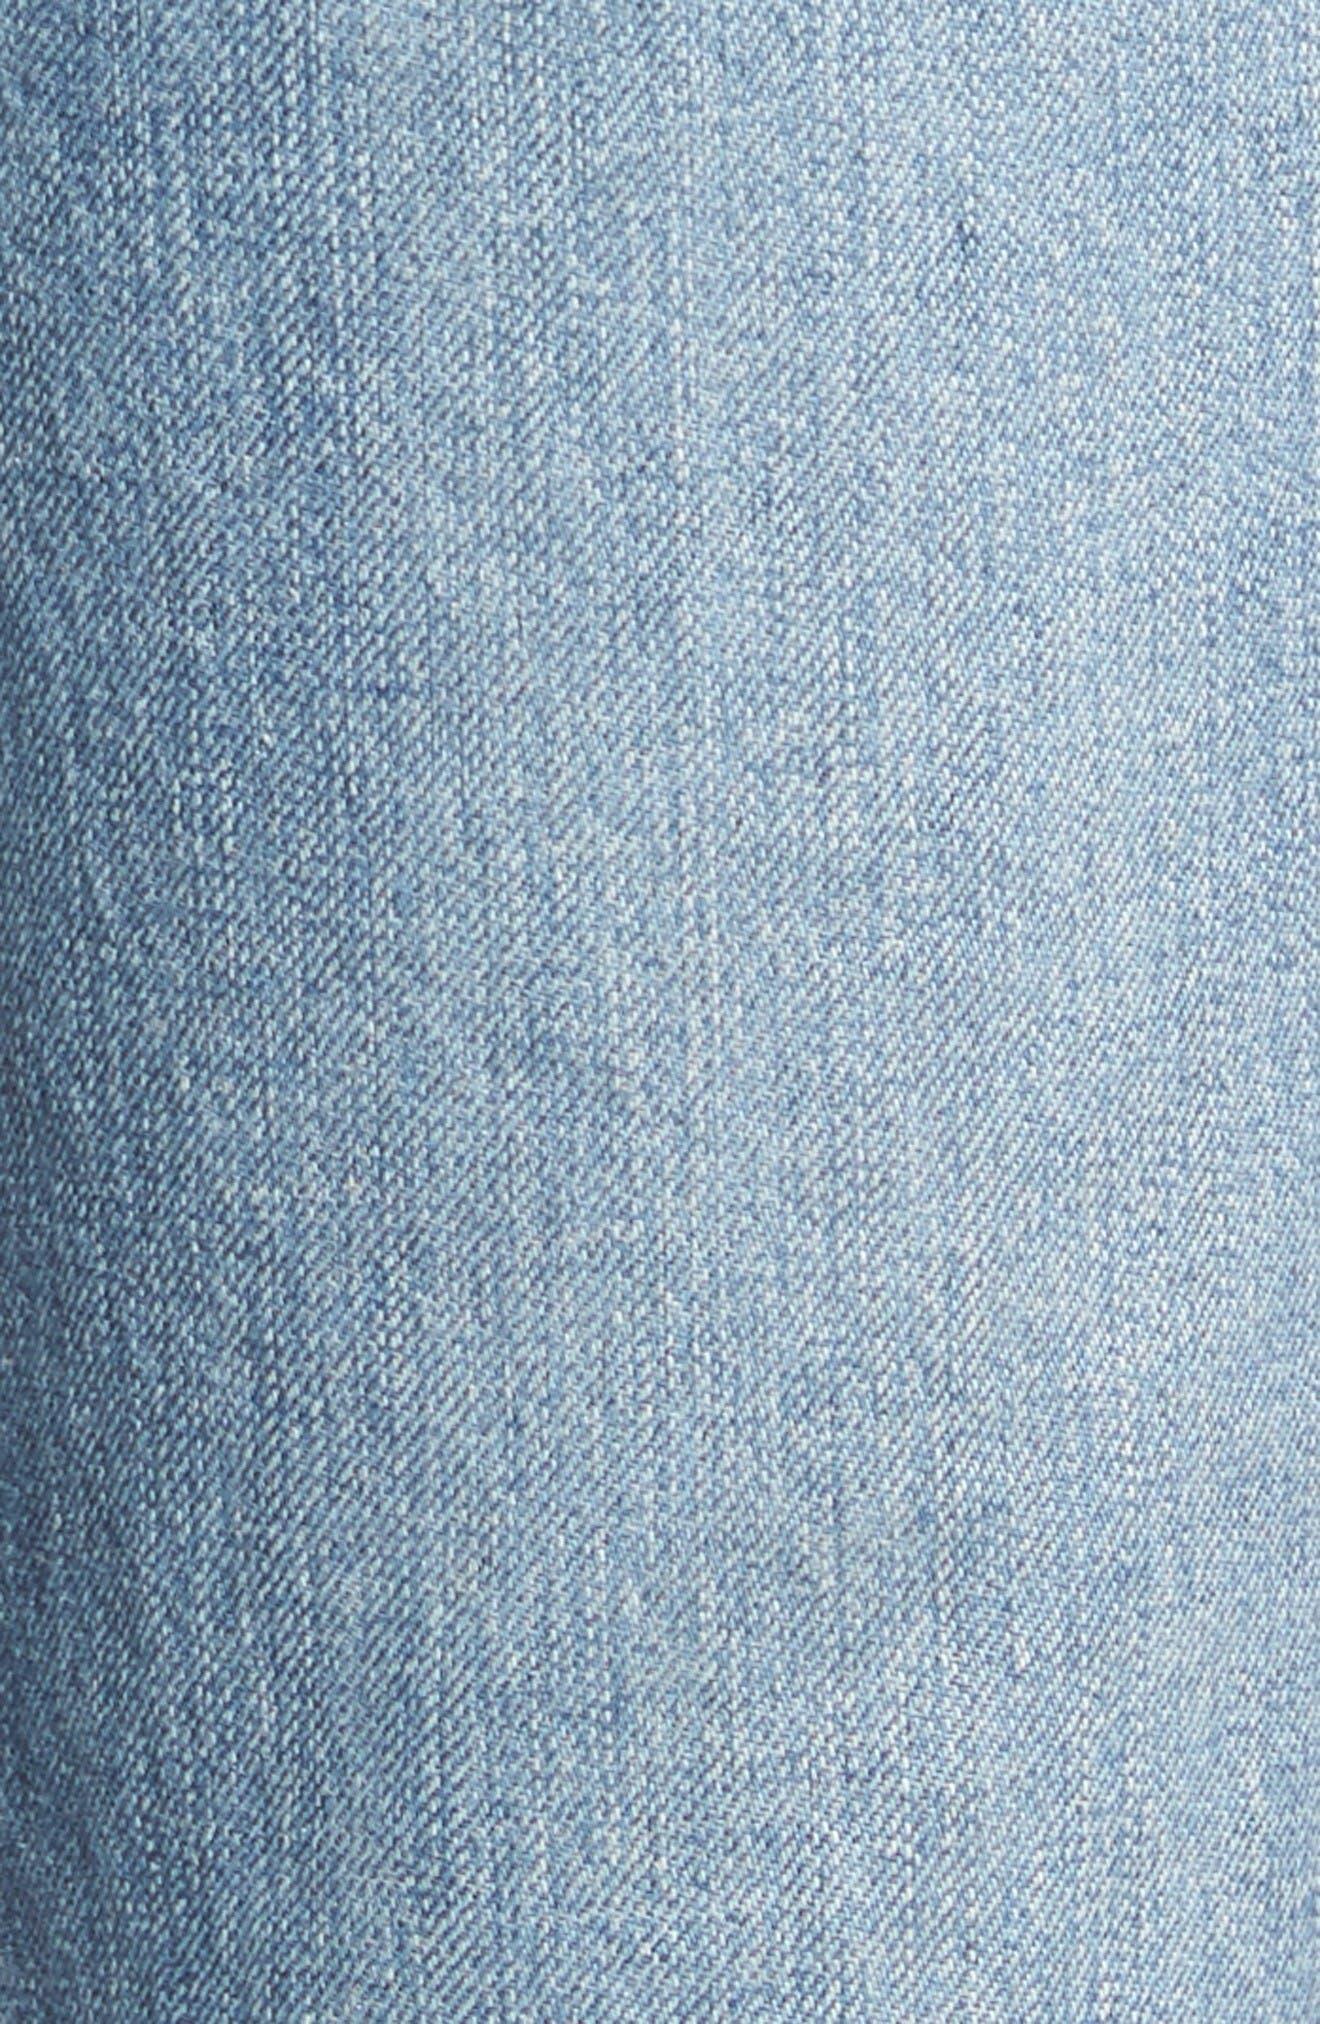 Alternate Image 5  - AG Leah Linen Overalls